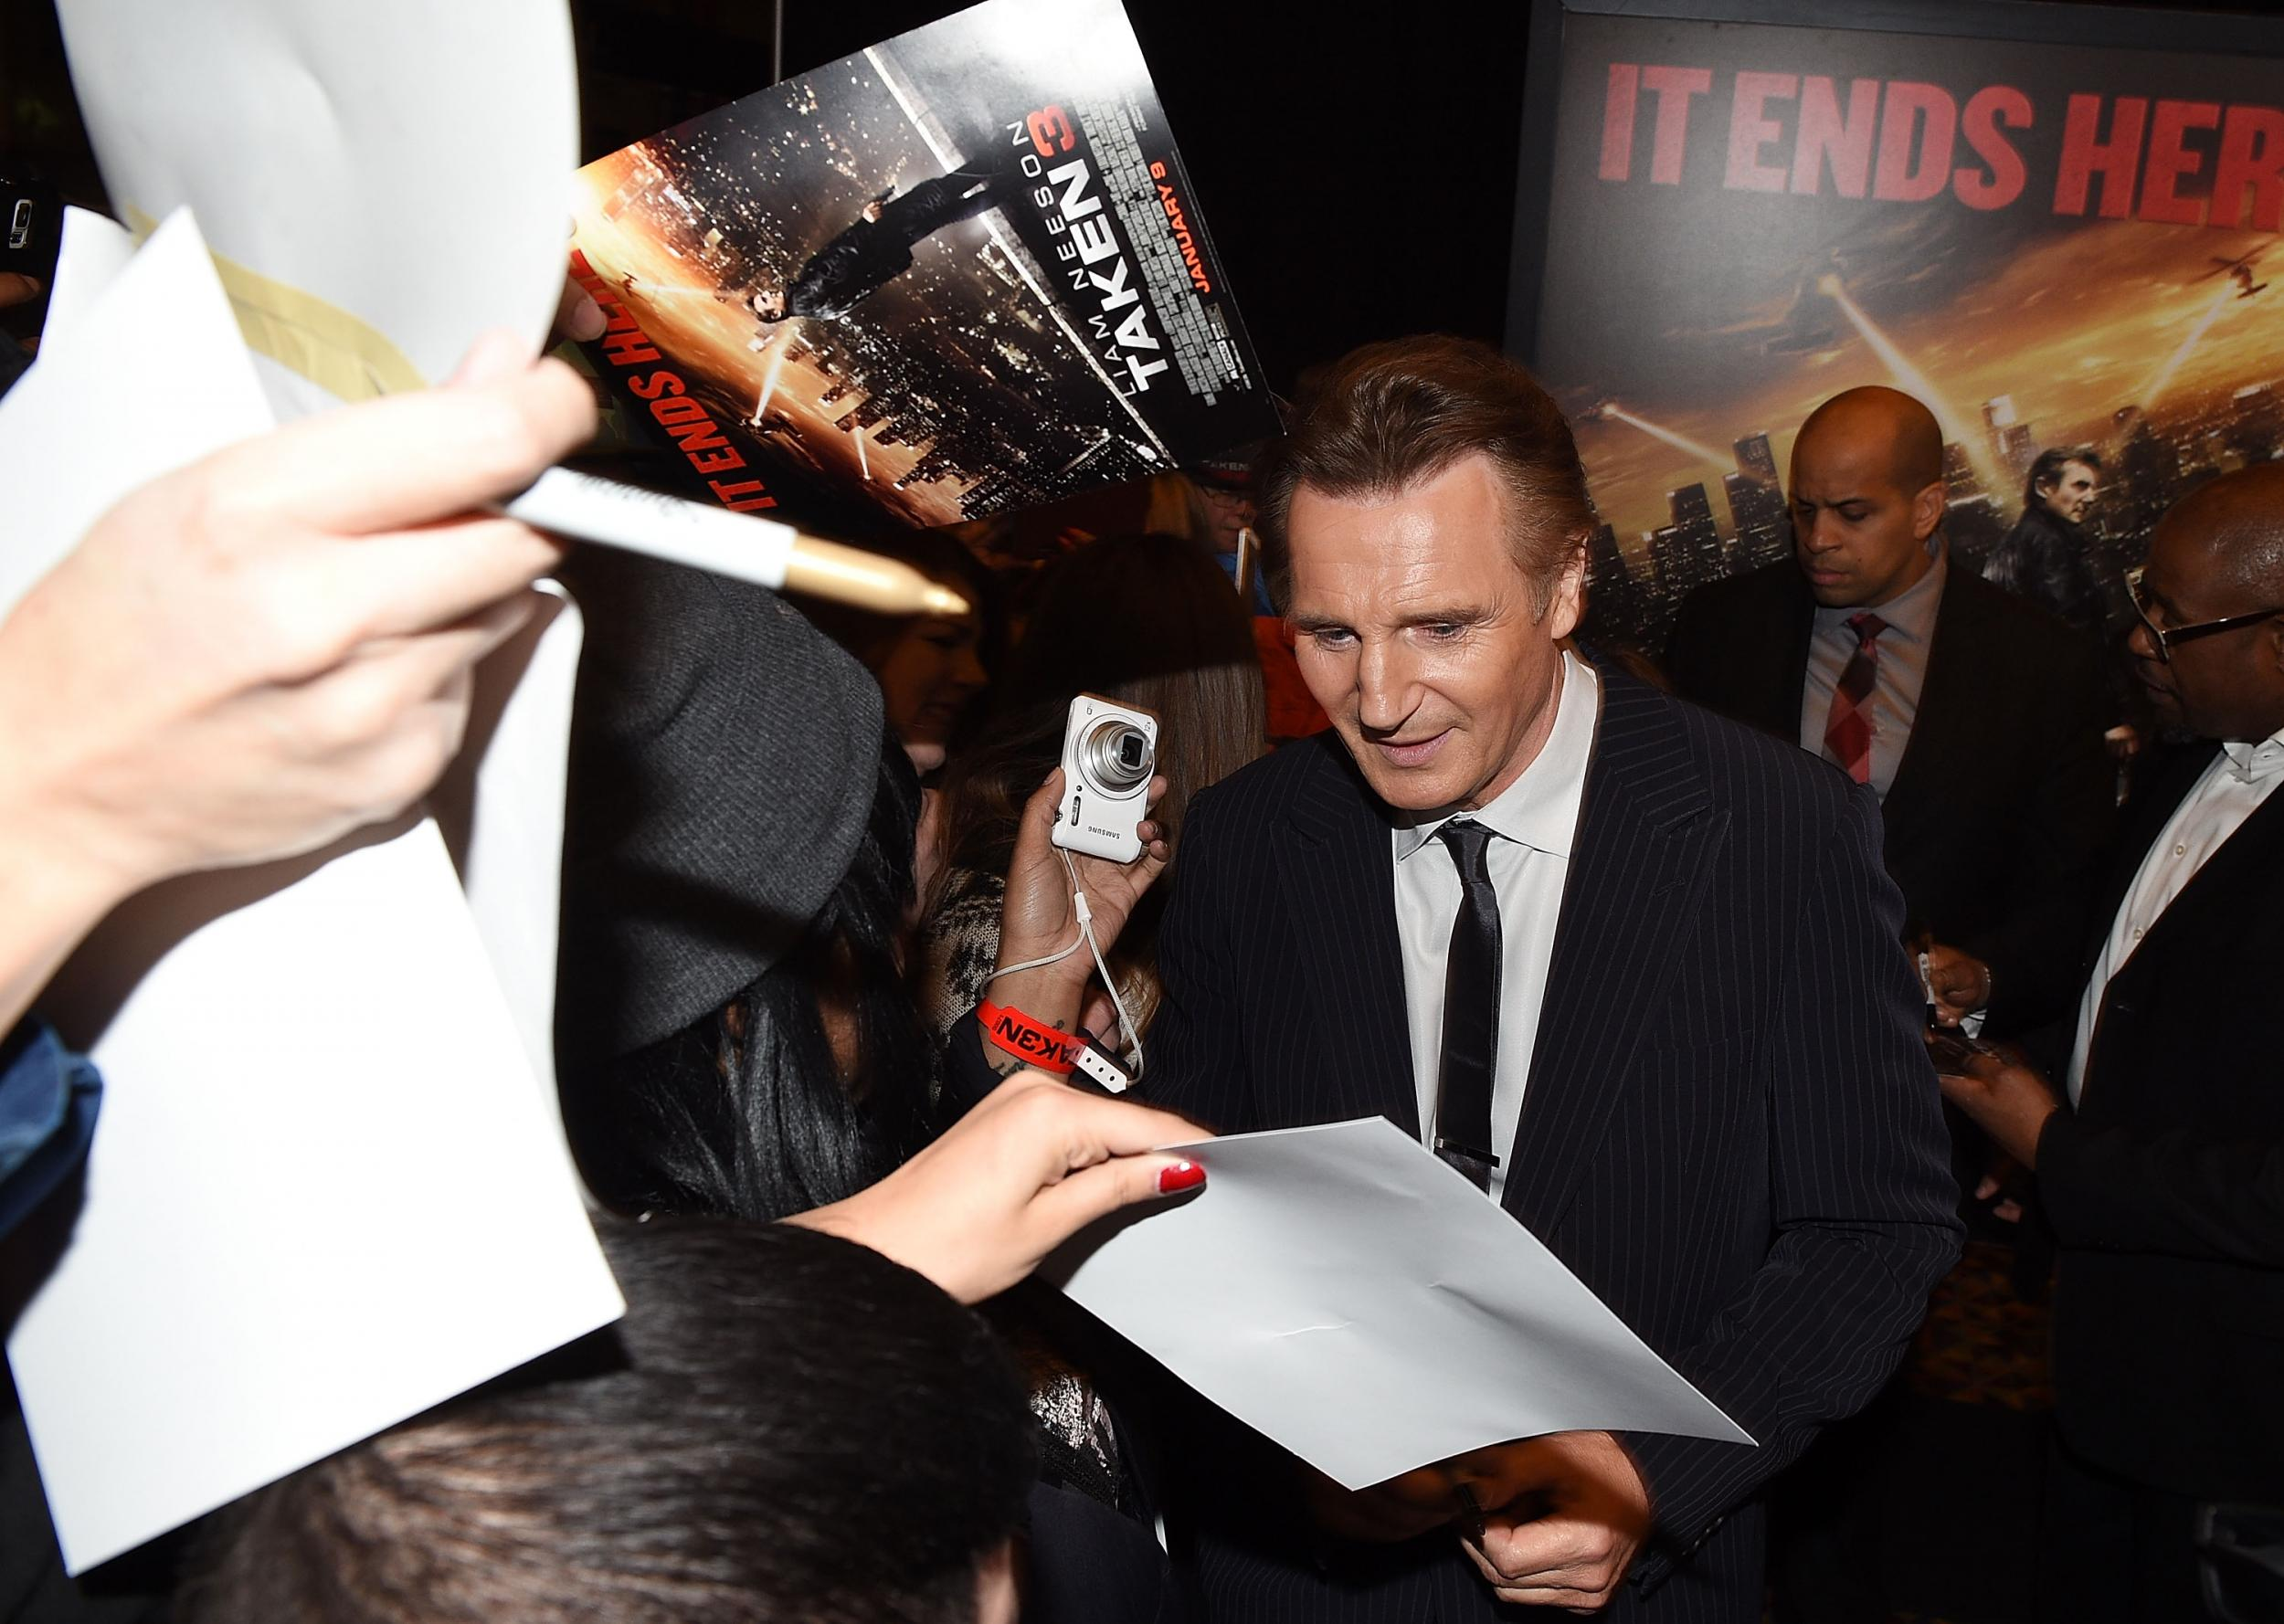 Liam Neeson interview: Rape, race and how I learnt revenge